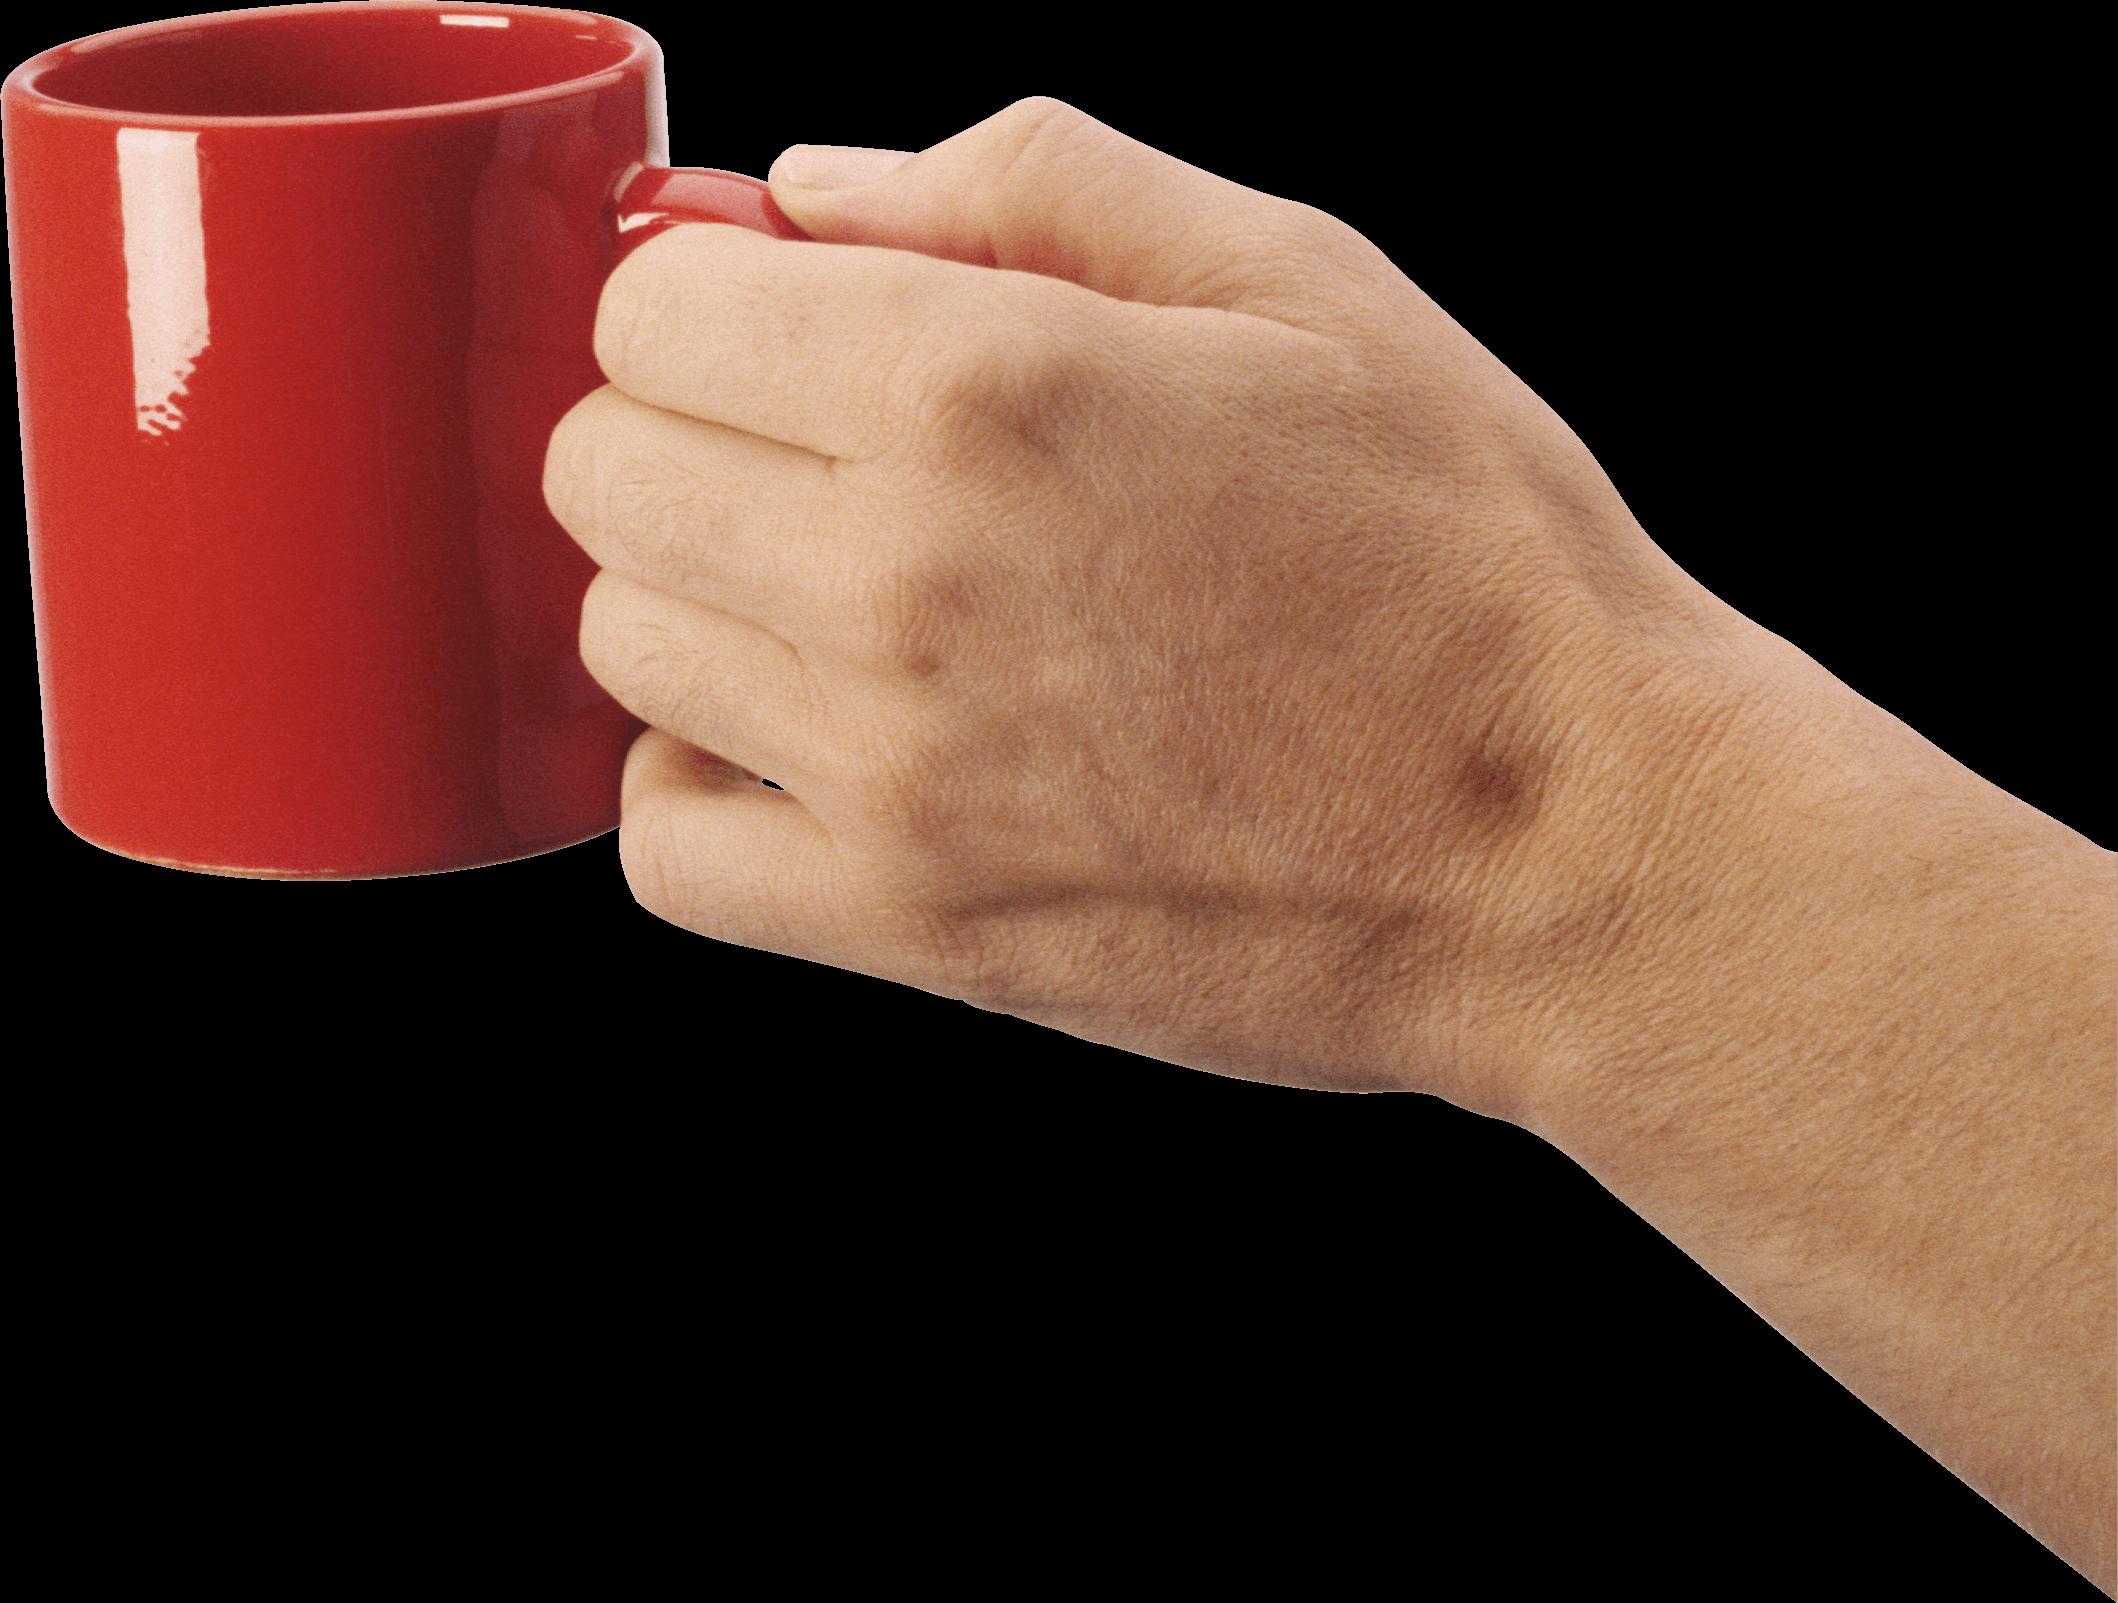 Holding Coffee Mug Hand Transparent Png Stickpng